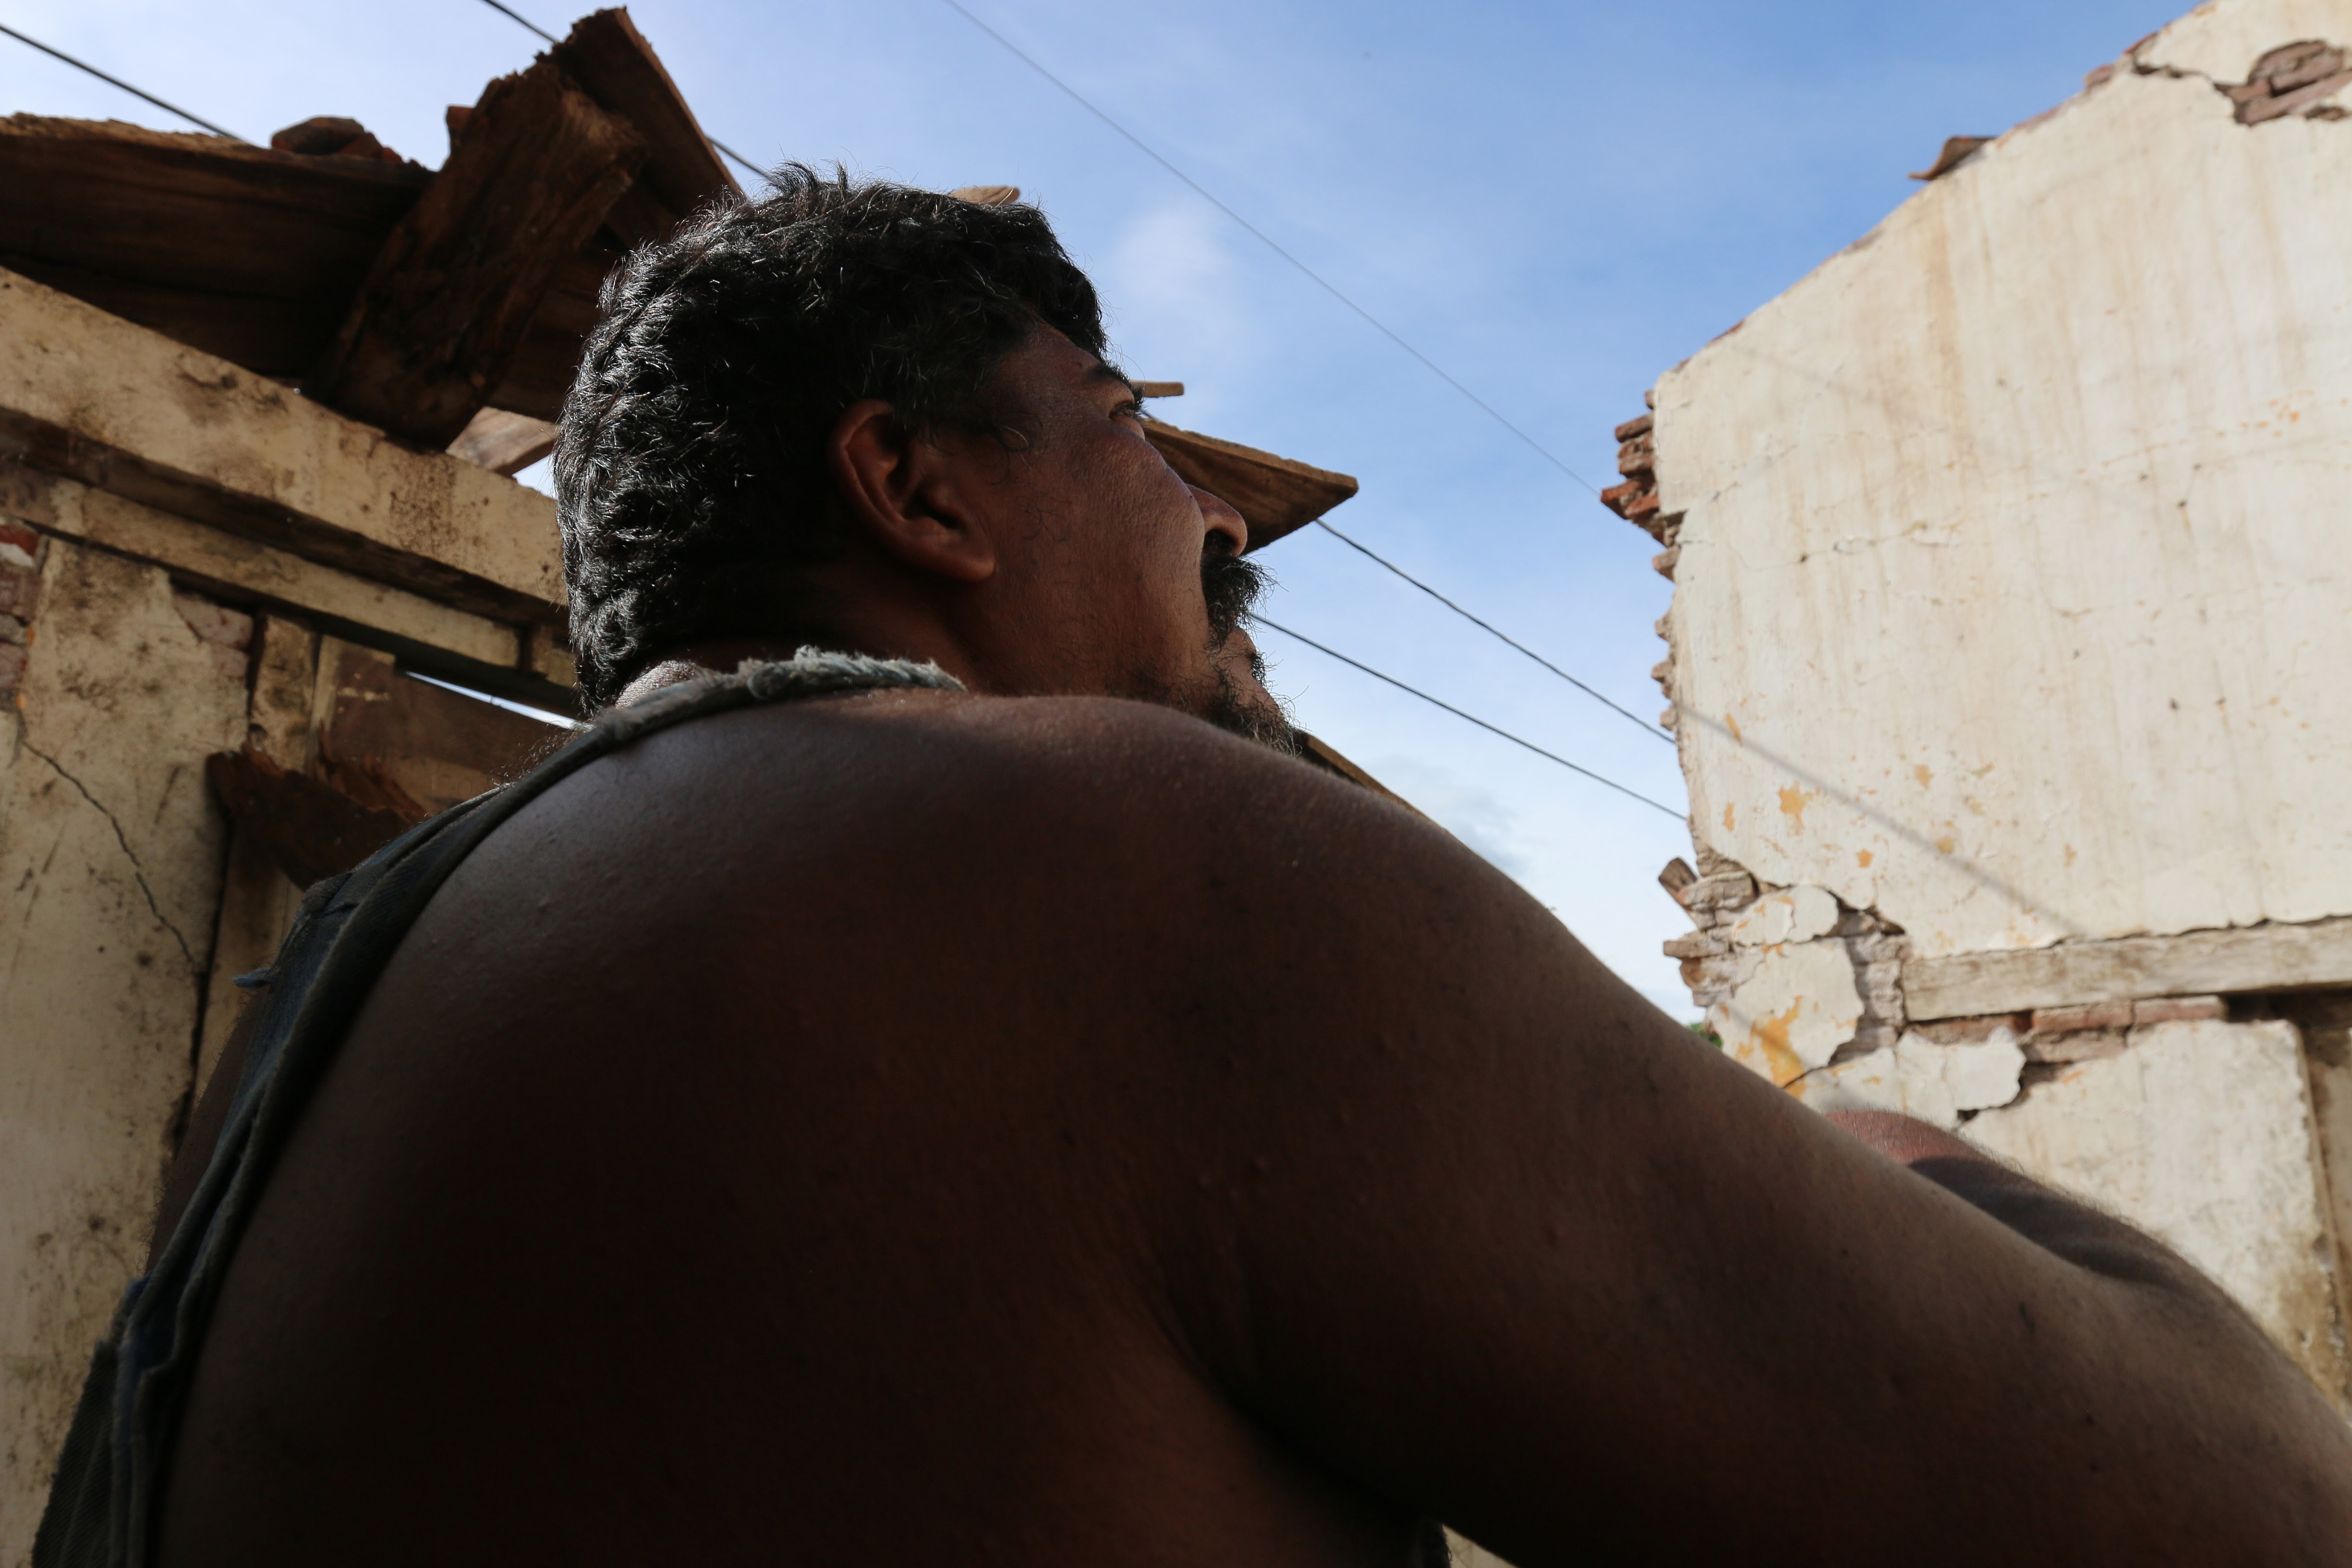 (Photo by Nadia del Pozo / Felipe Luna for Direct Relief)